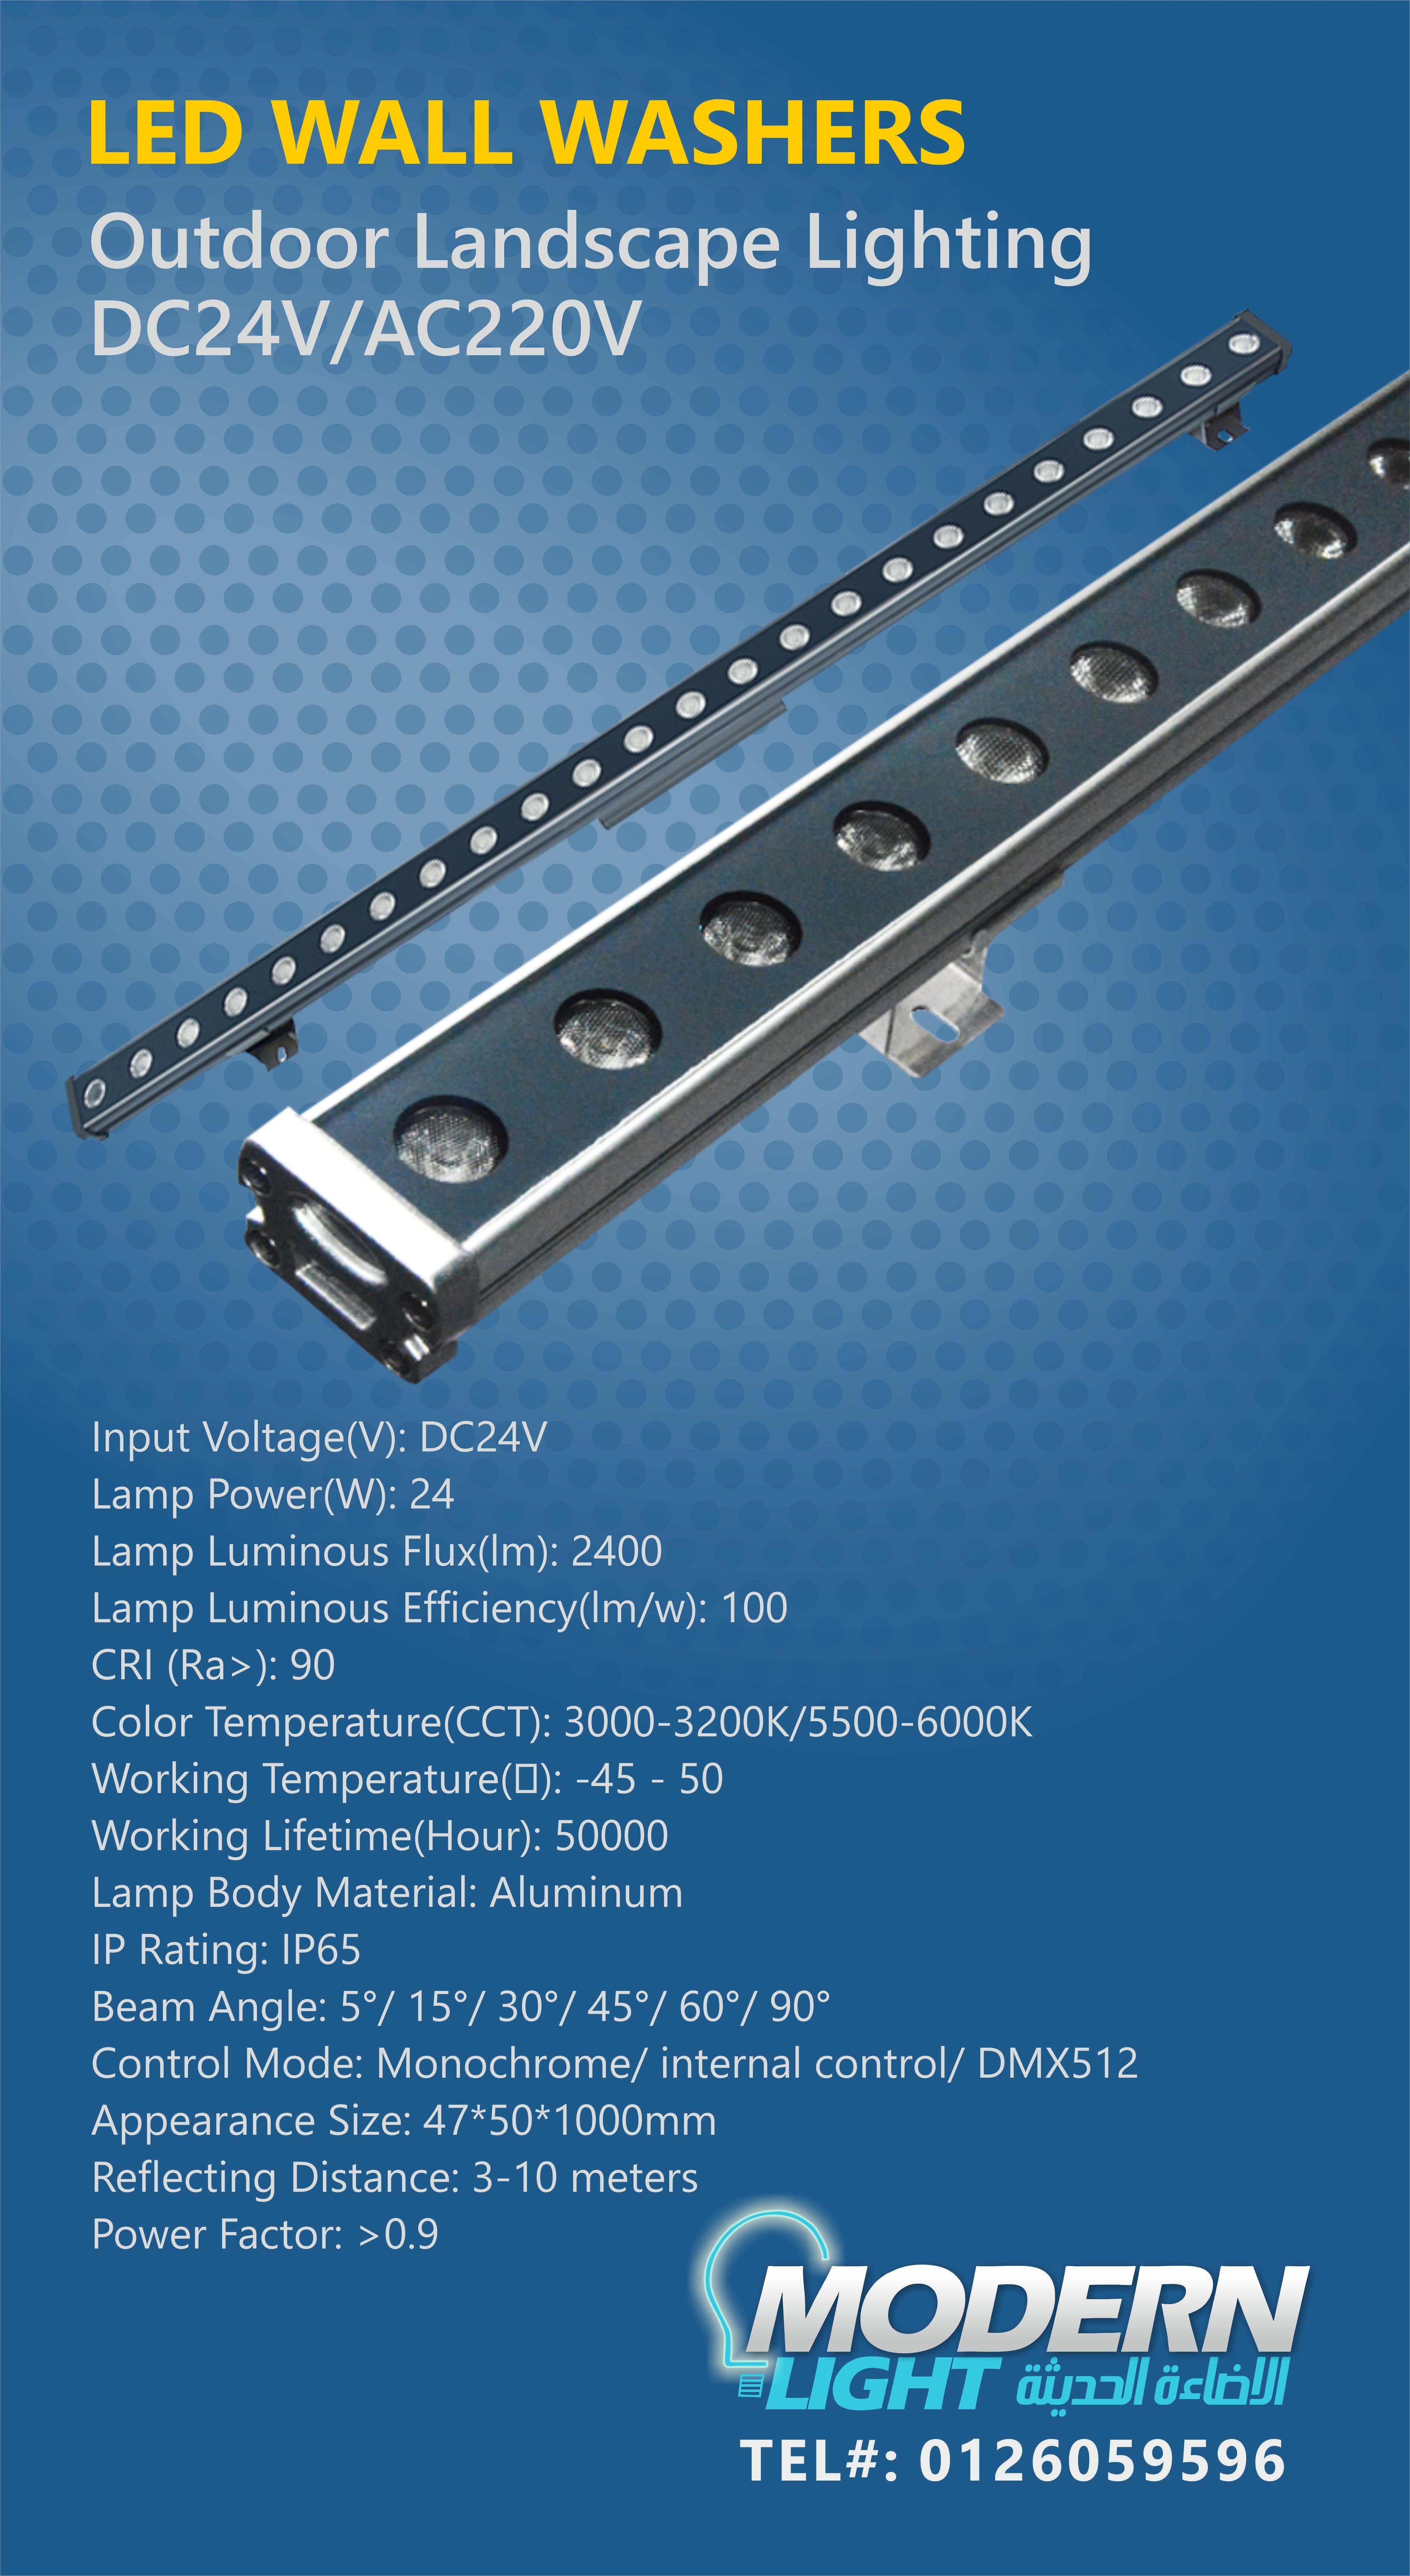 LED WALL WASHERS MODERNLIGHT - JEDDAH - TEL#: 0126059596 #Modernlight, #modernlightJeddah, #modernlightksa